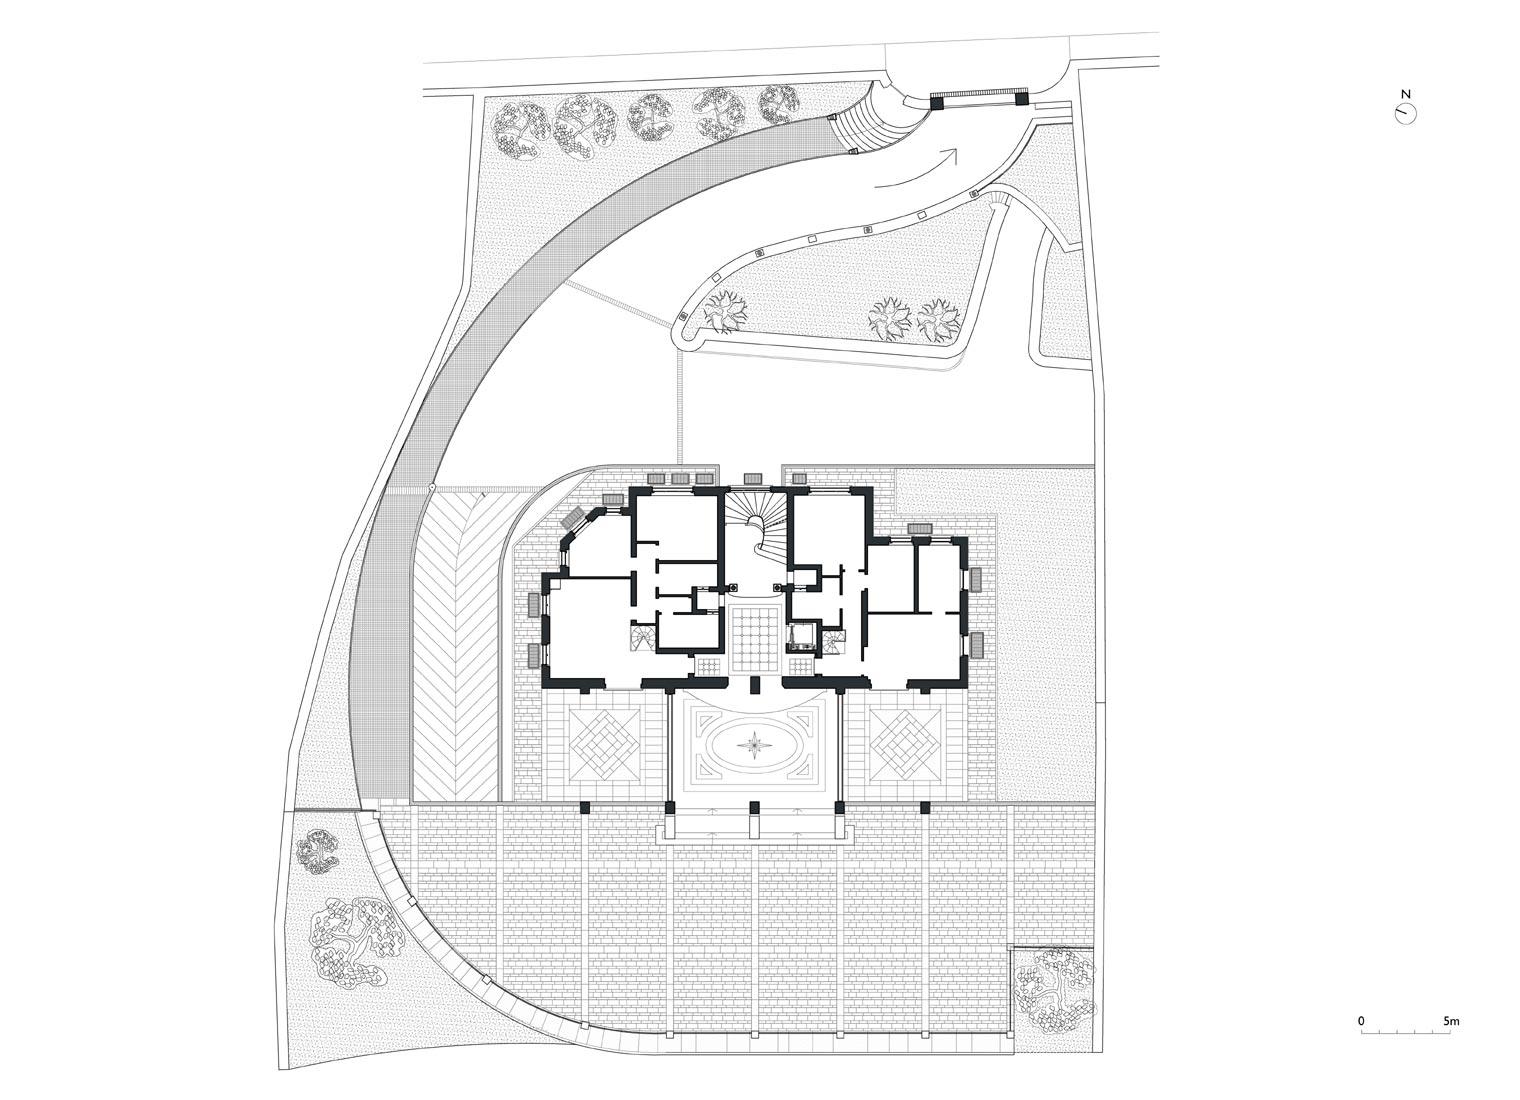 vk-architetti_casali_plan